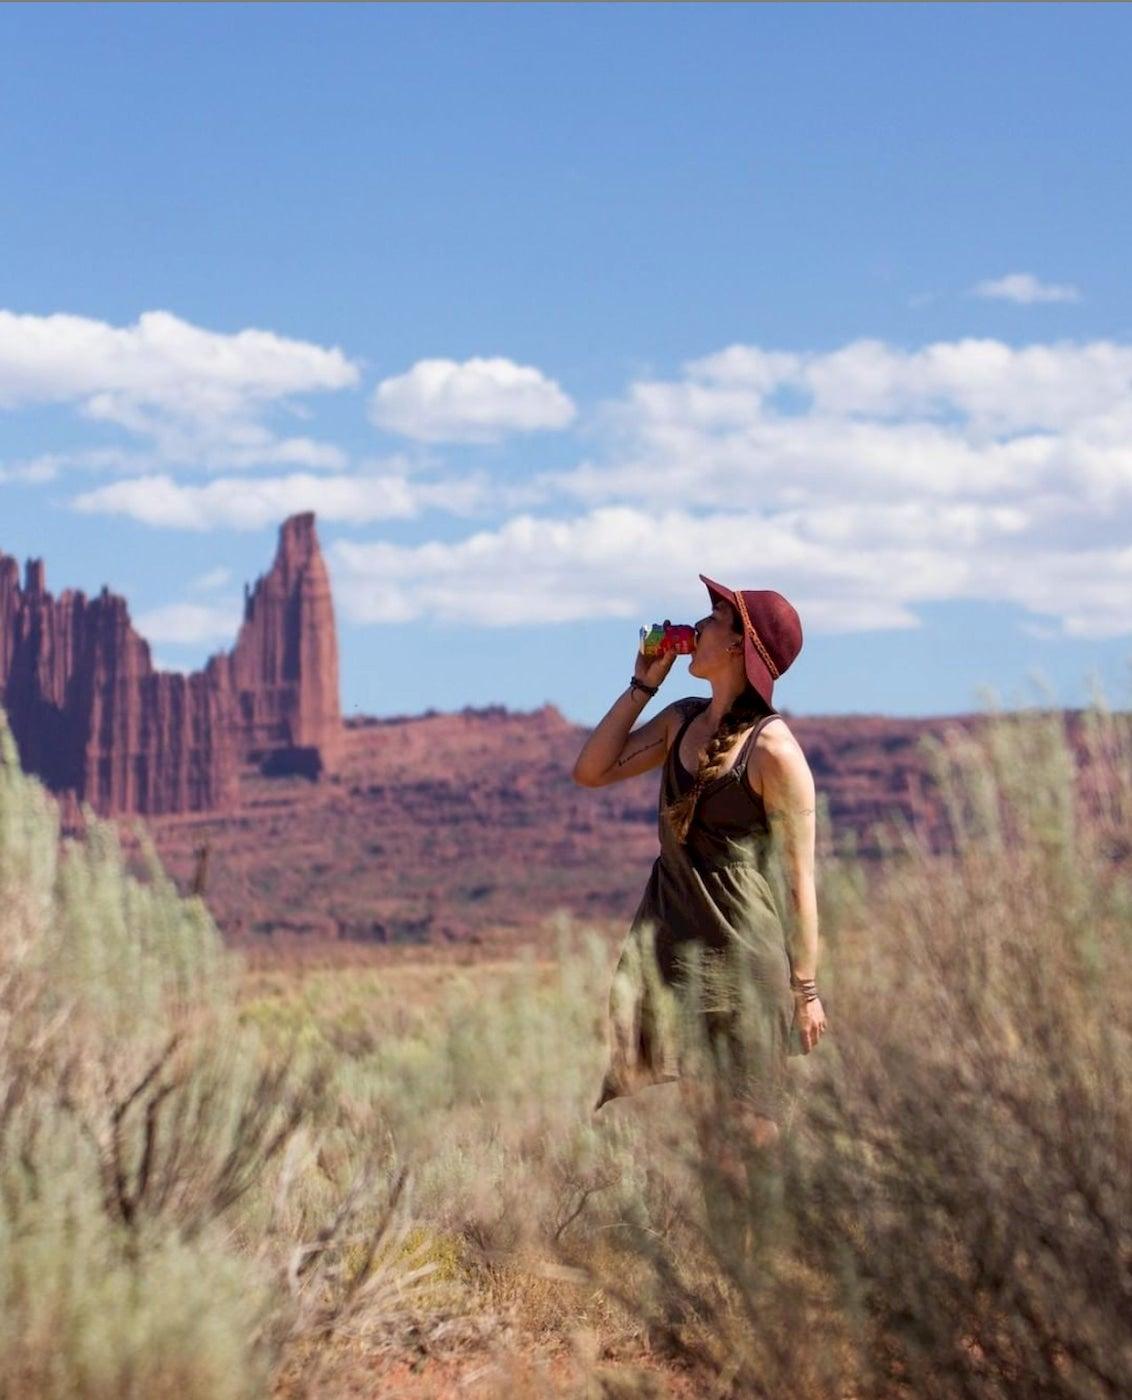 Megan drinking a soda in a field and felt hat in Utah.